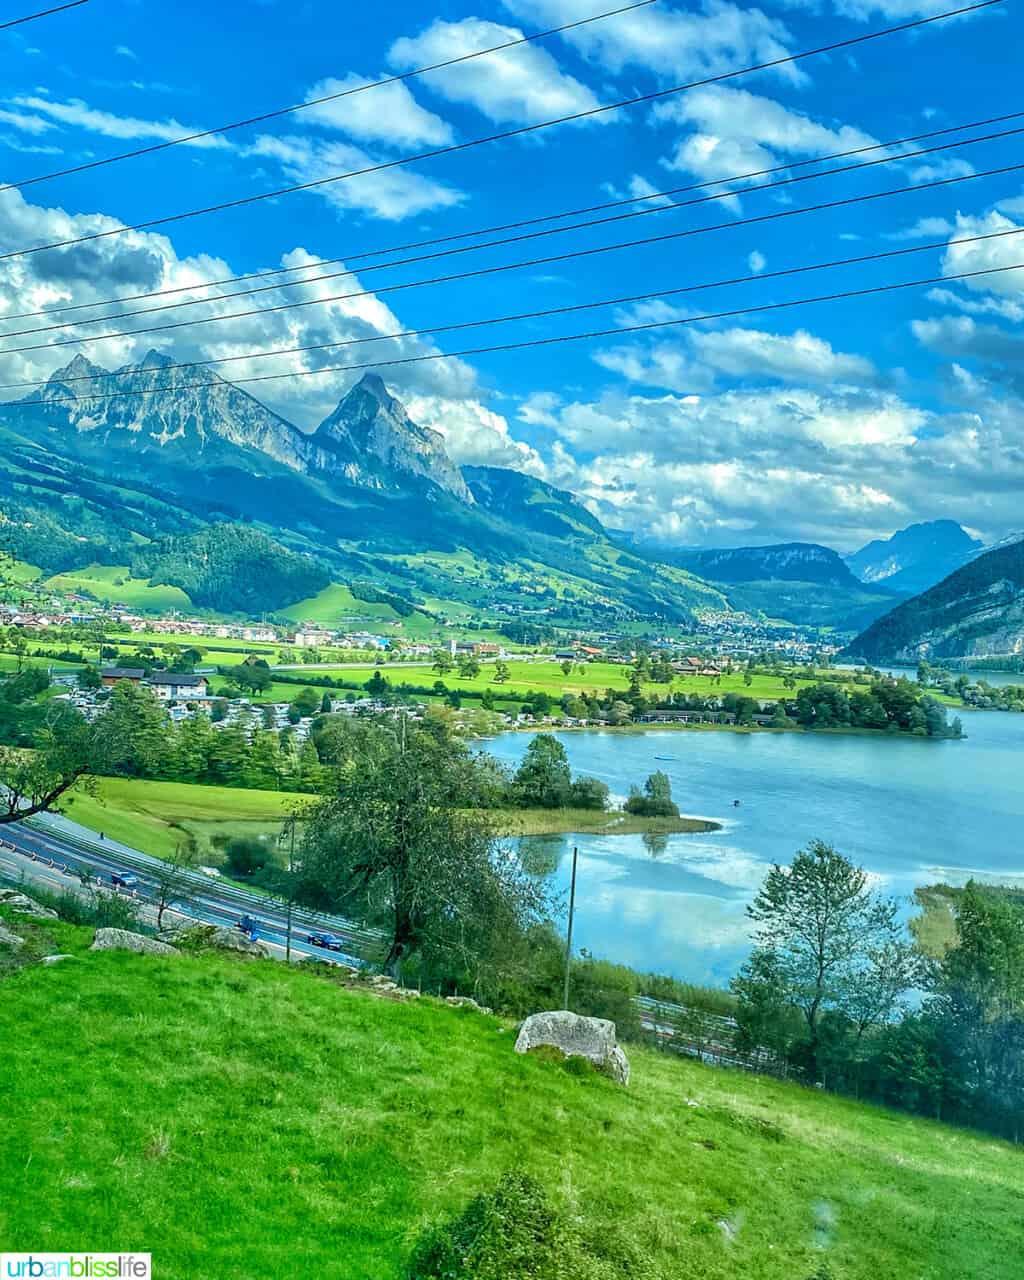 Switzerland train scenery from Lugano to Zurich